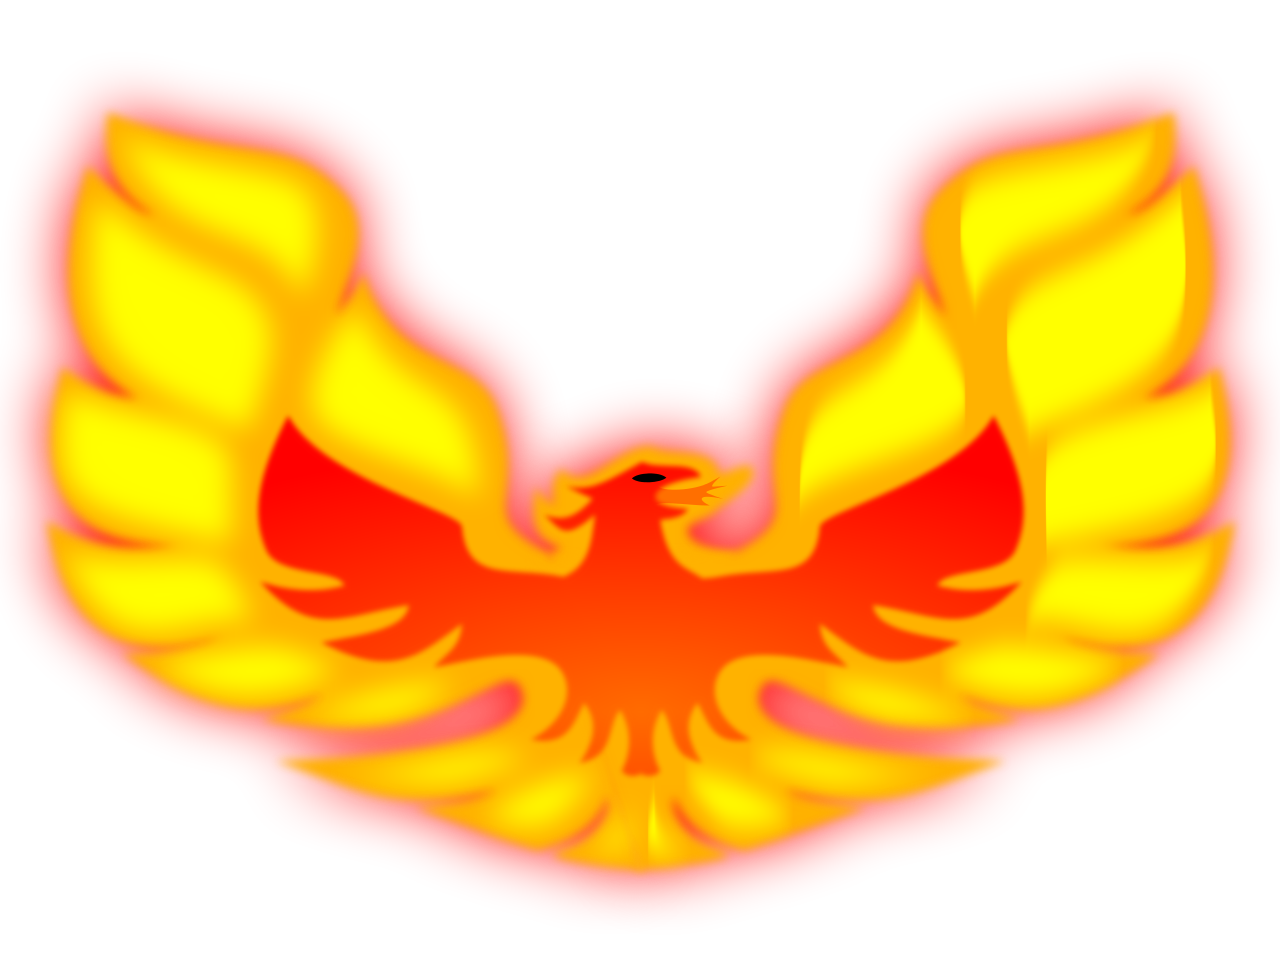 png royalty free stock phoenix svg copyright #114998522